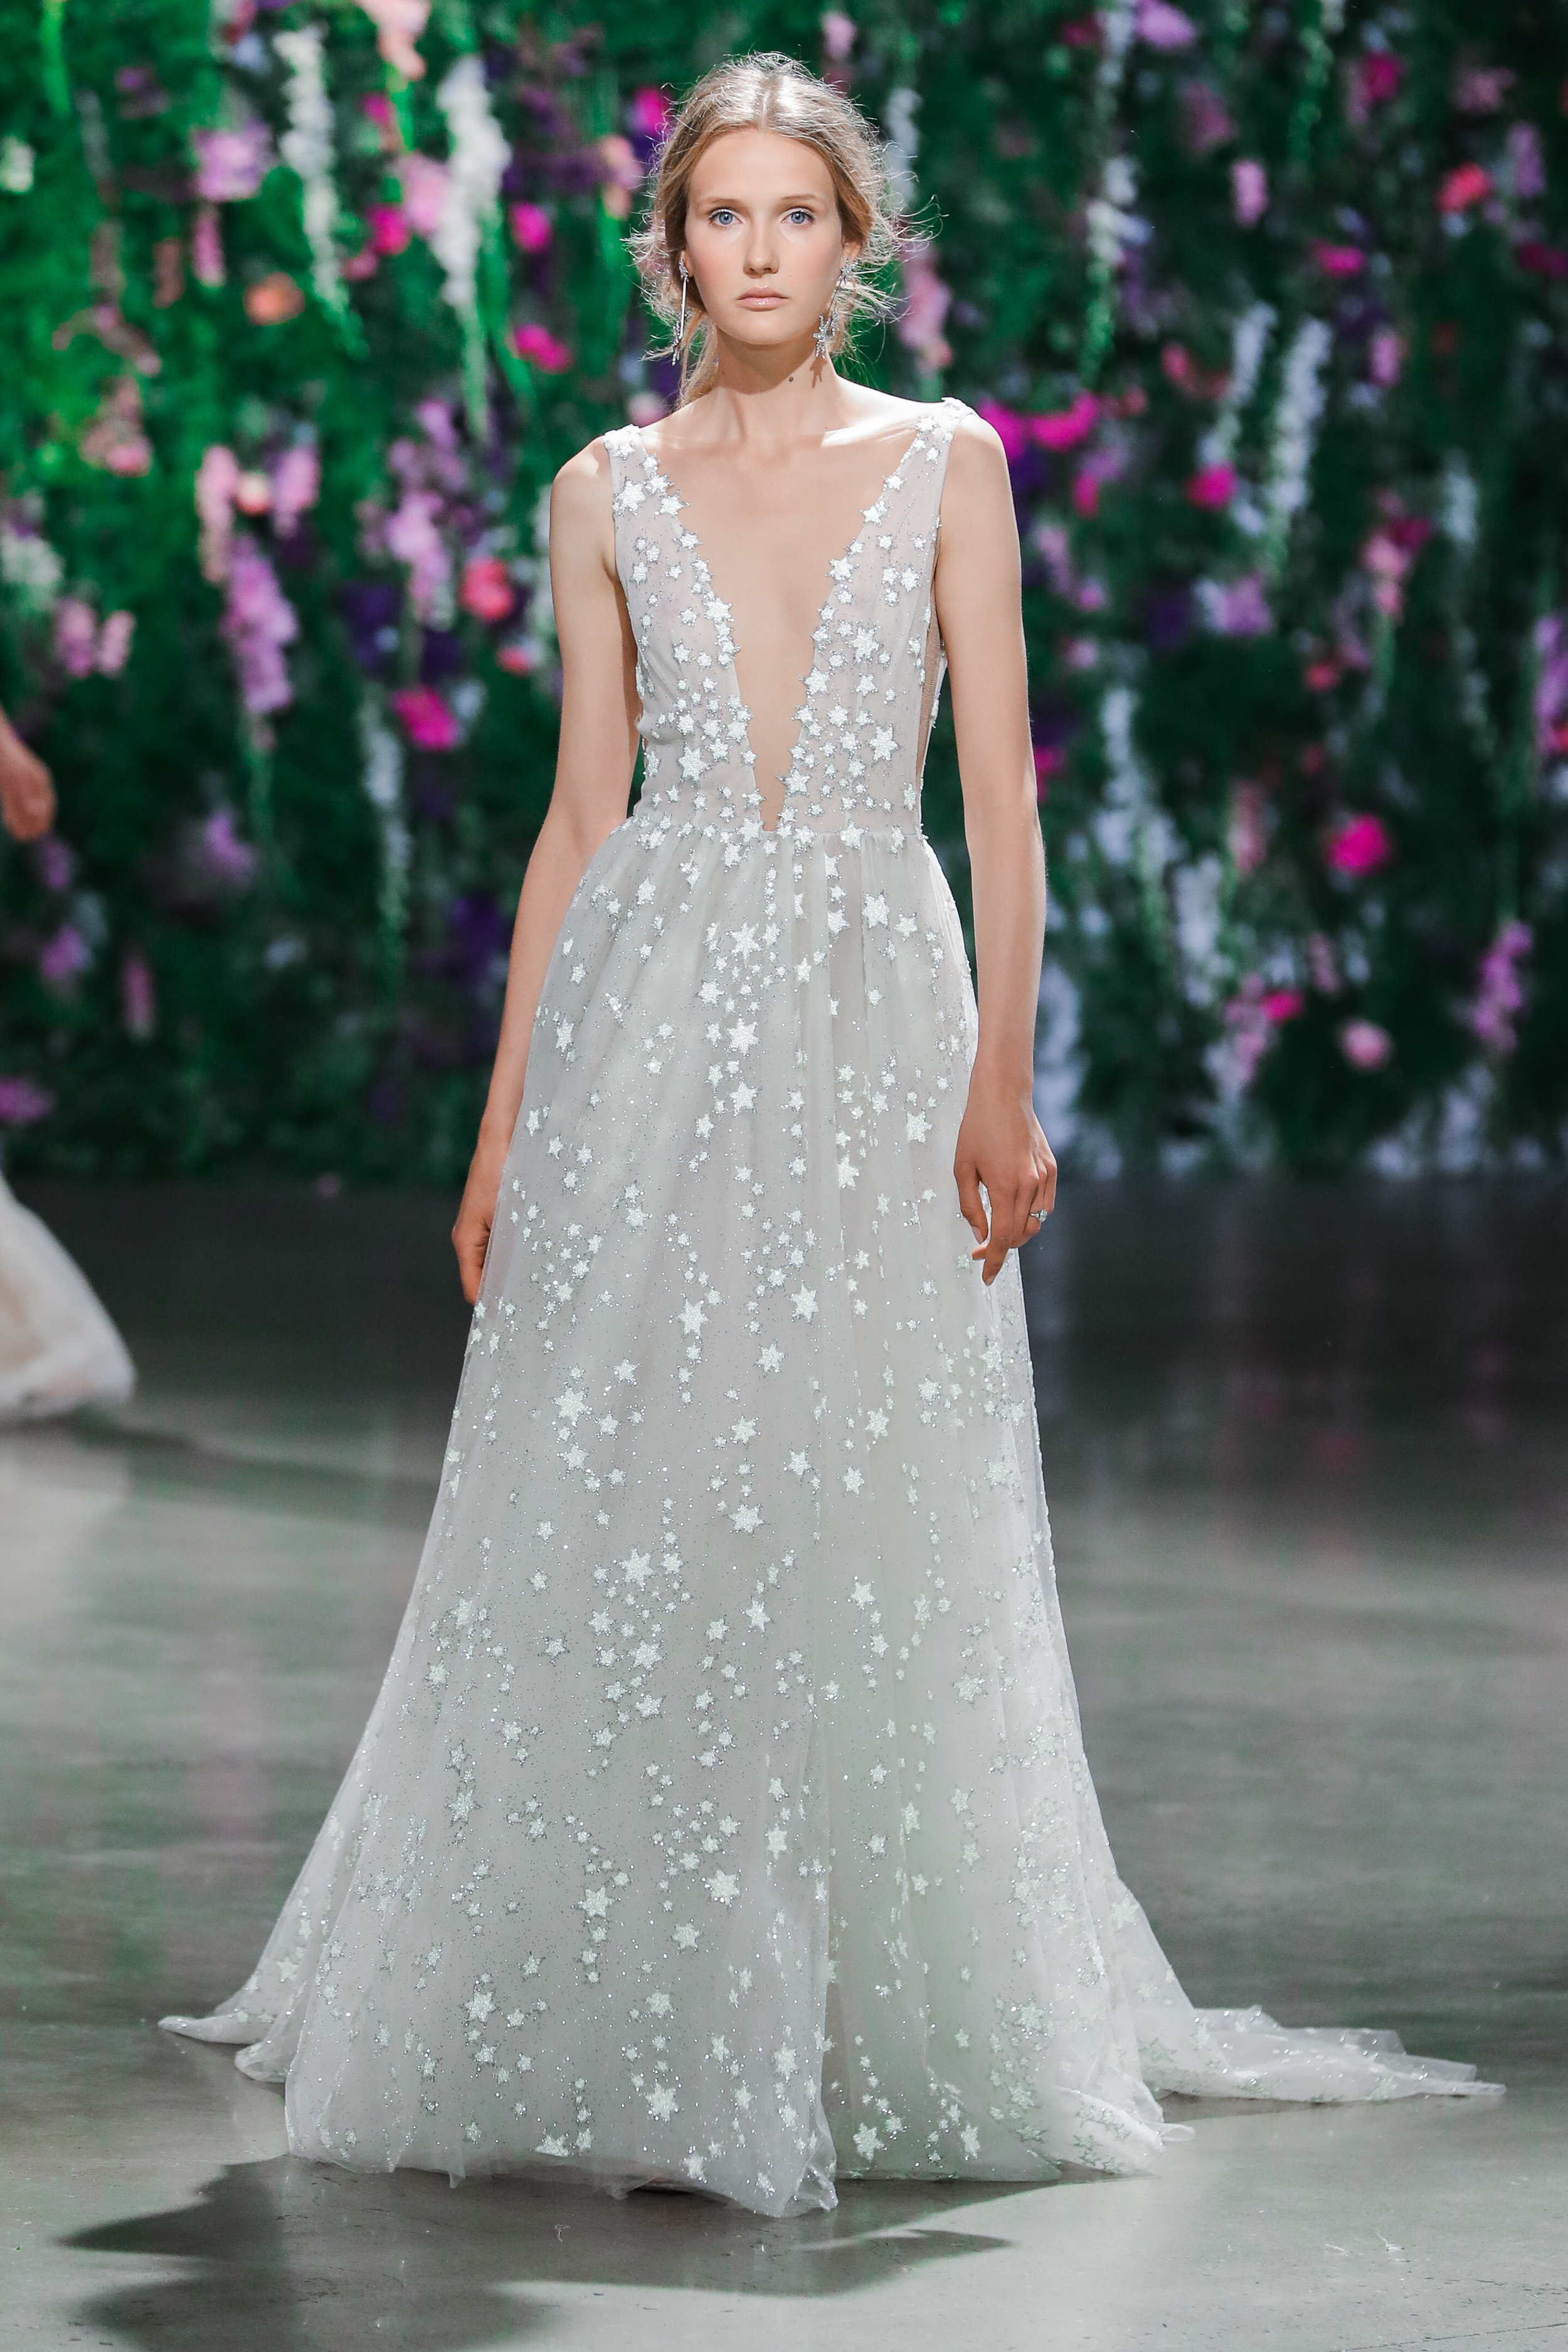 star-print-wedding-dress